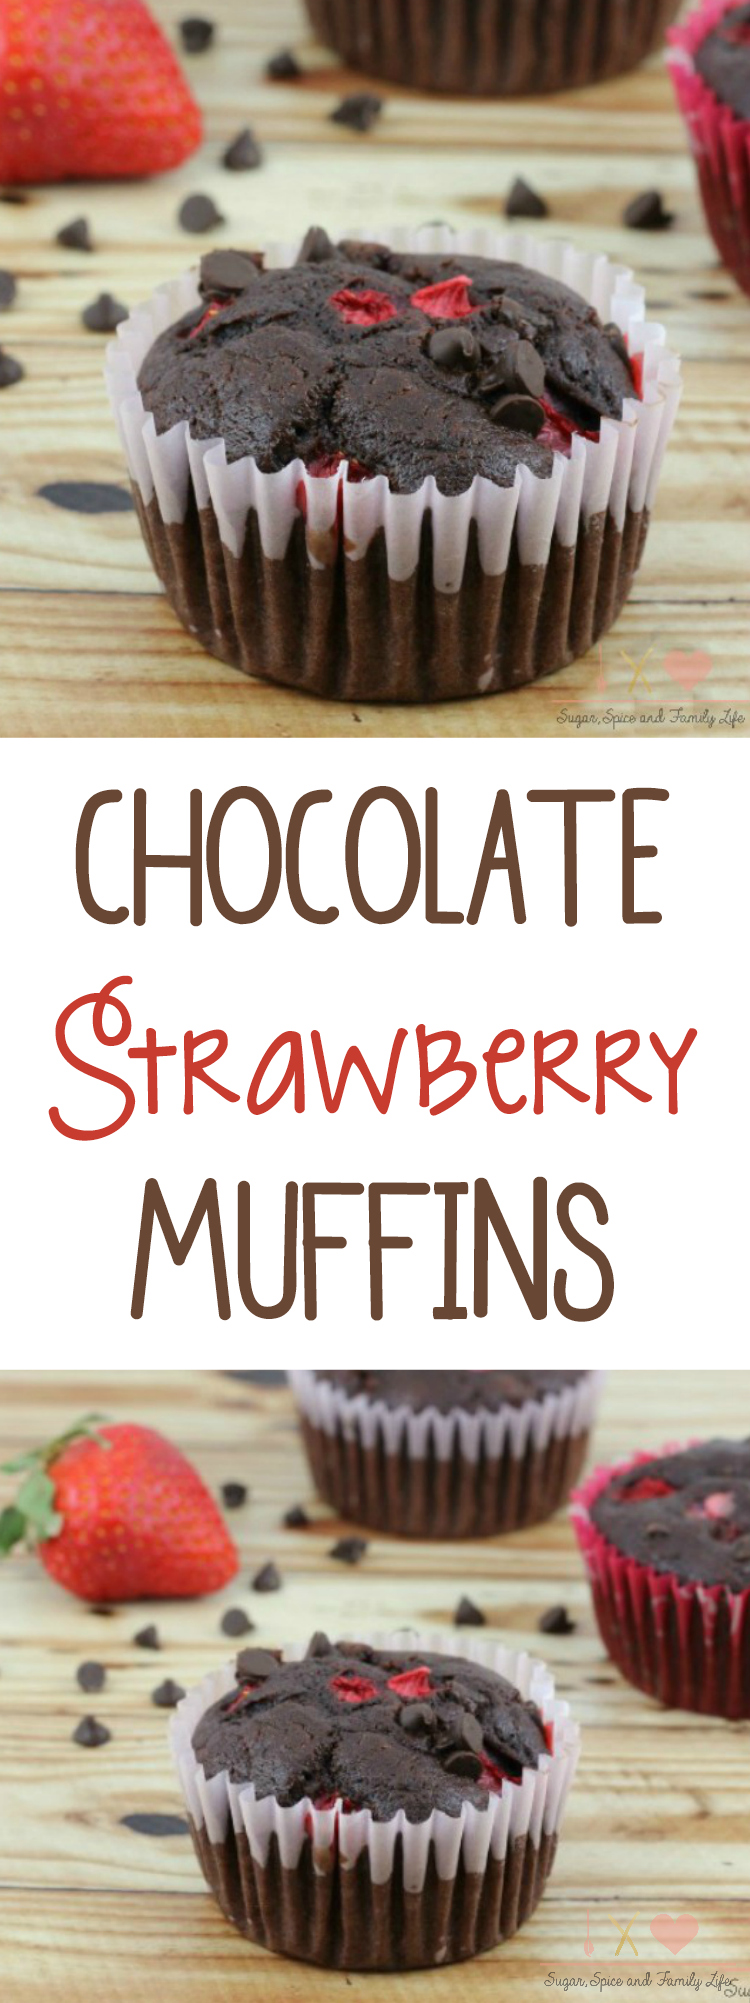 Chocolate Strawberry Muffins Recipe